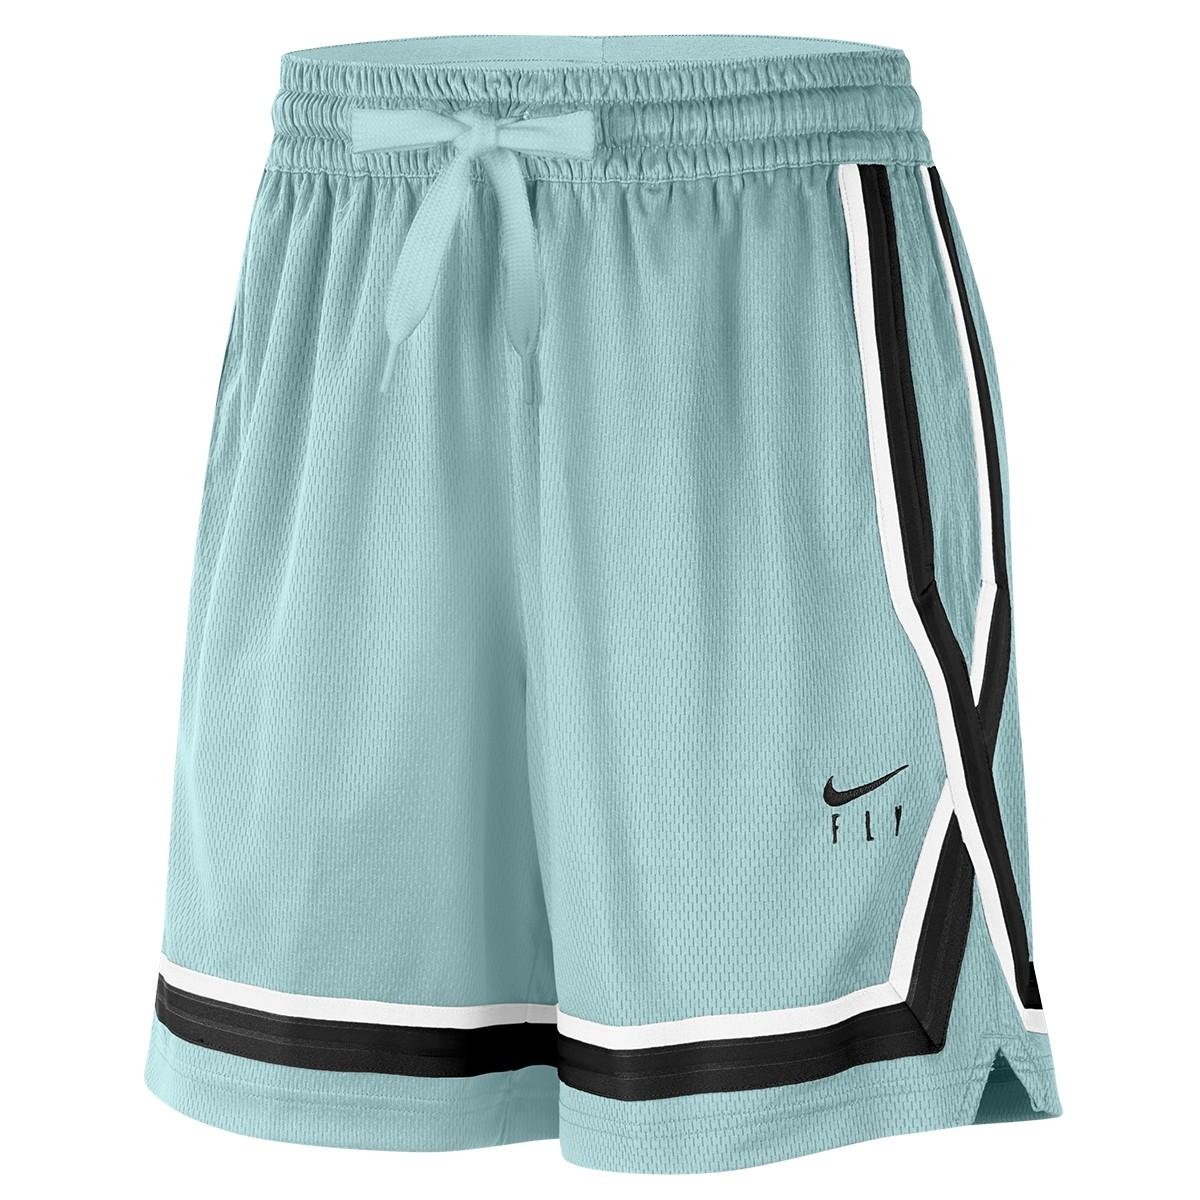 Pantalón Corto Nike Dri-FIT Swoosh Fly Woman 'Mint'